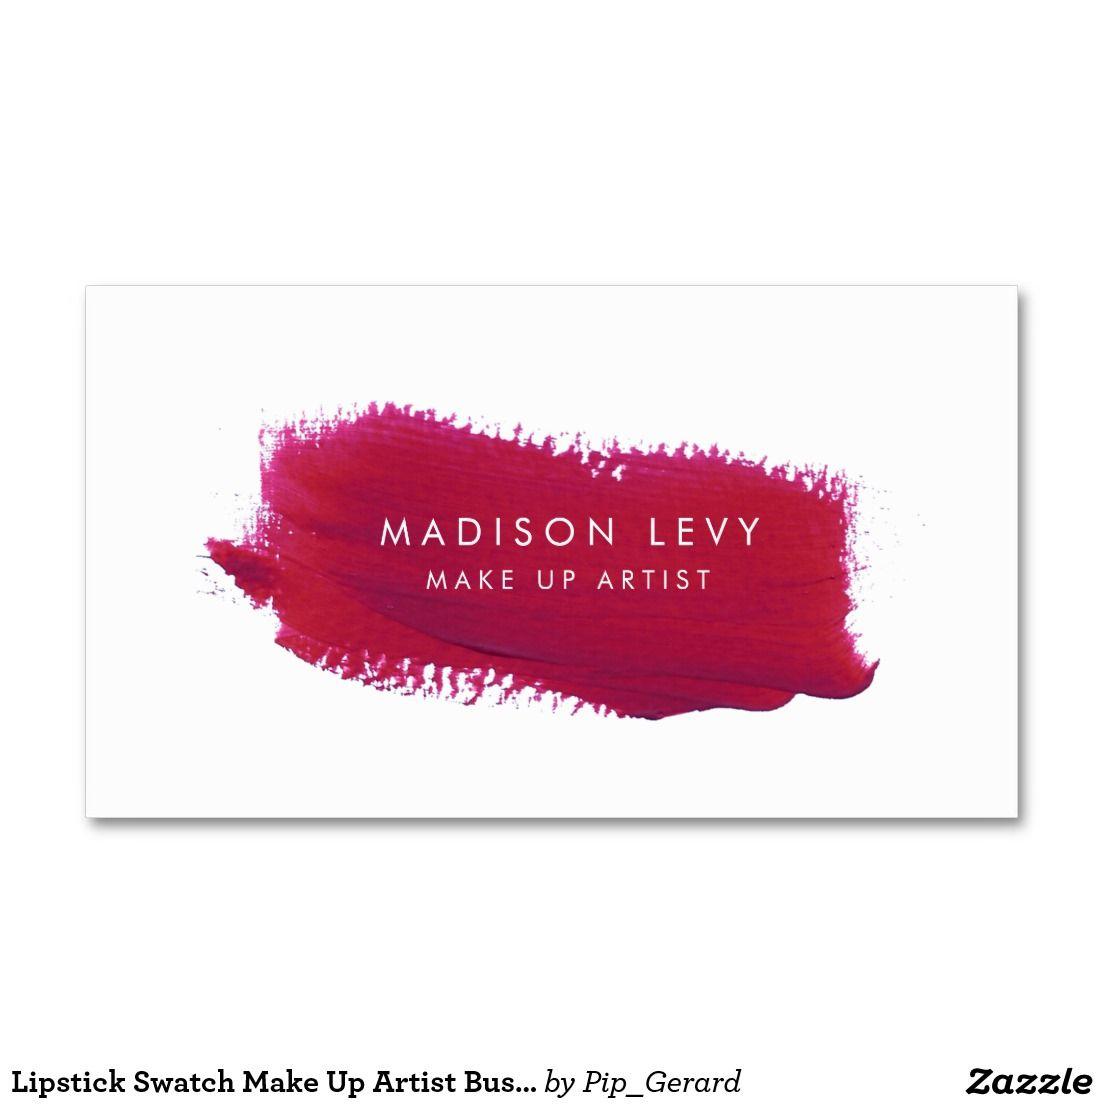 Lipstick Swatch Make Up Artist Business